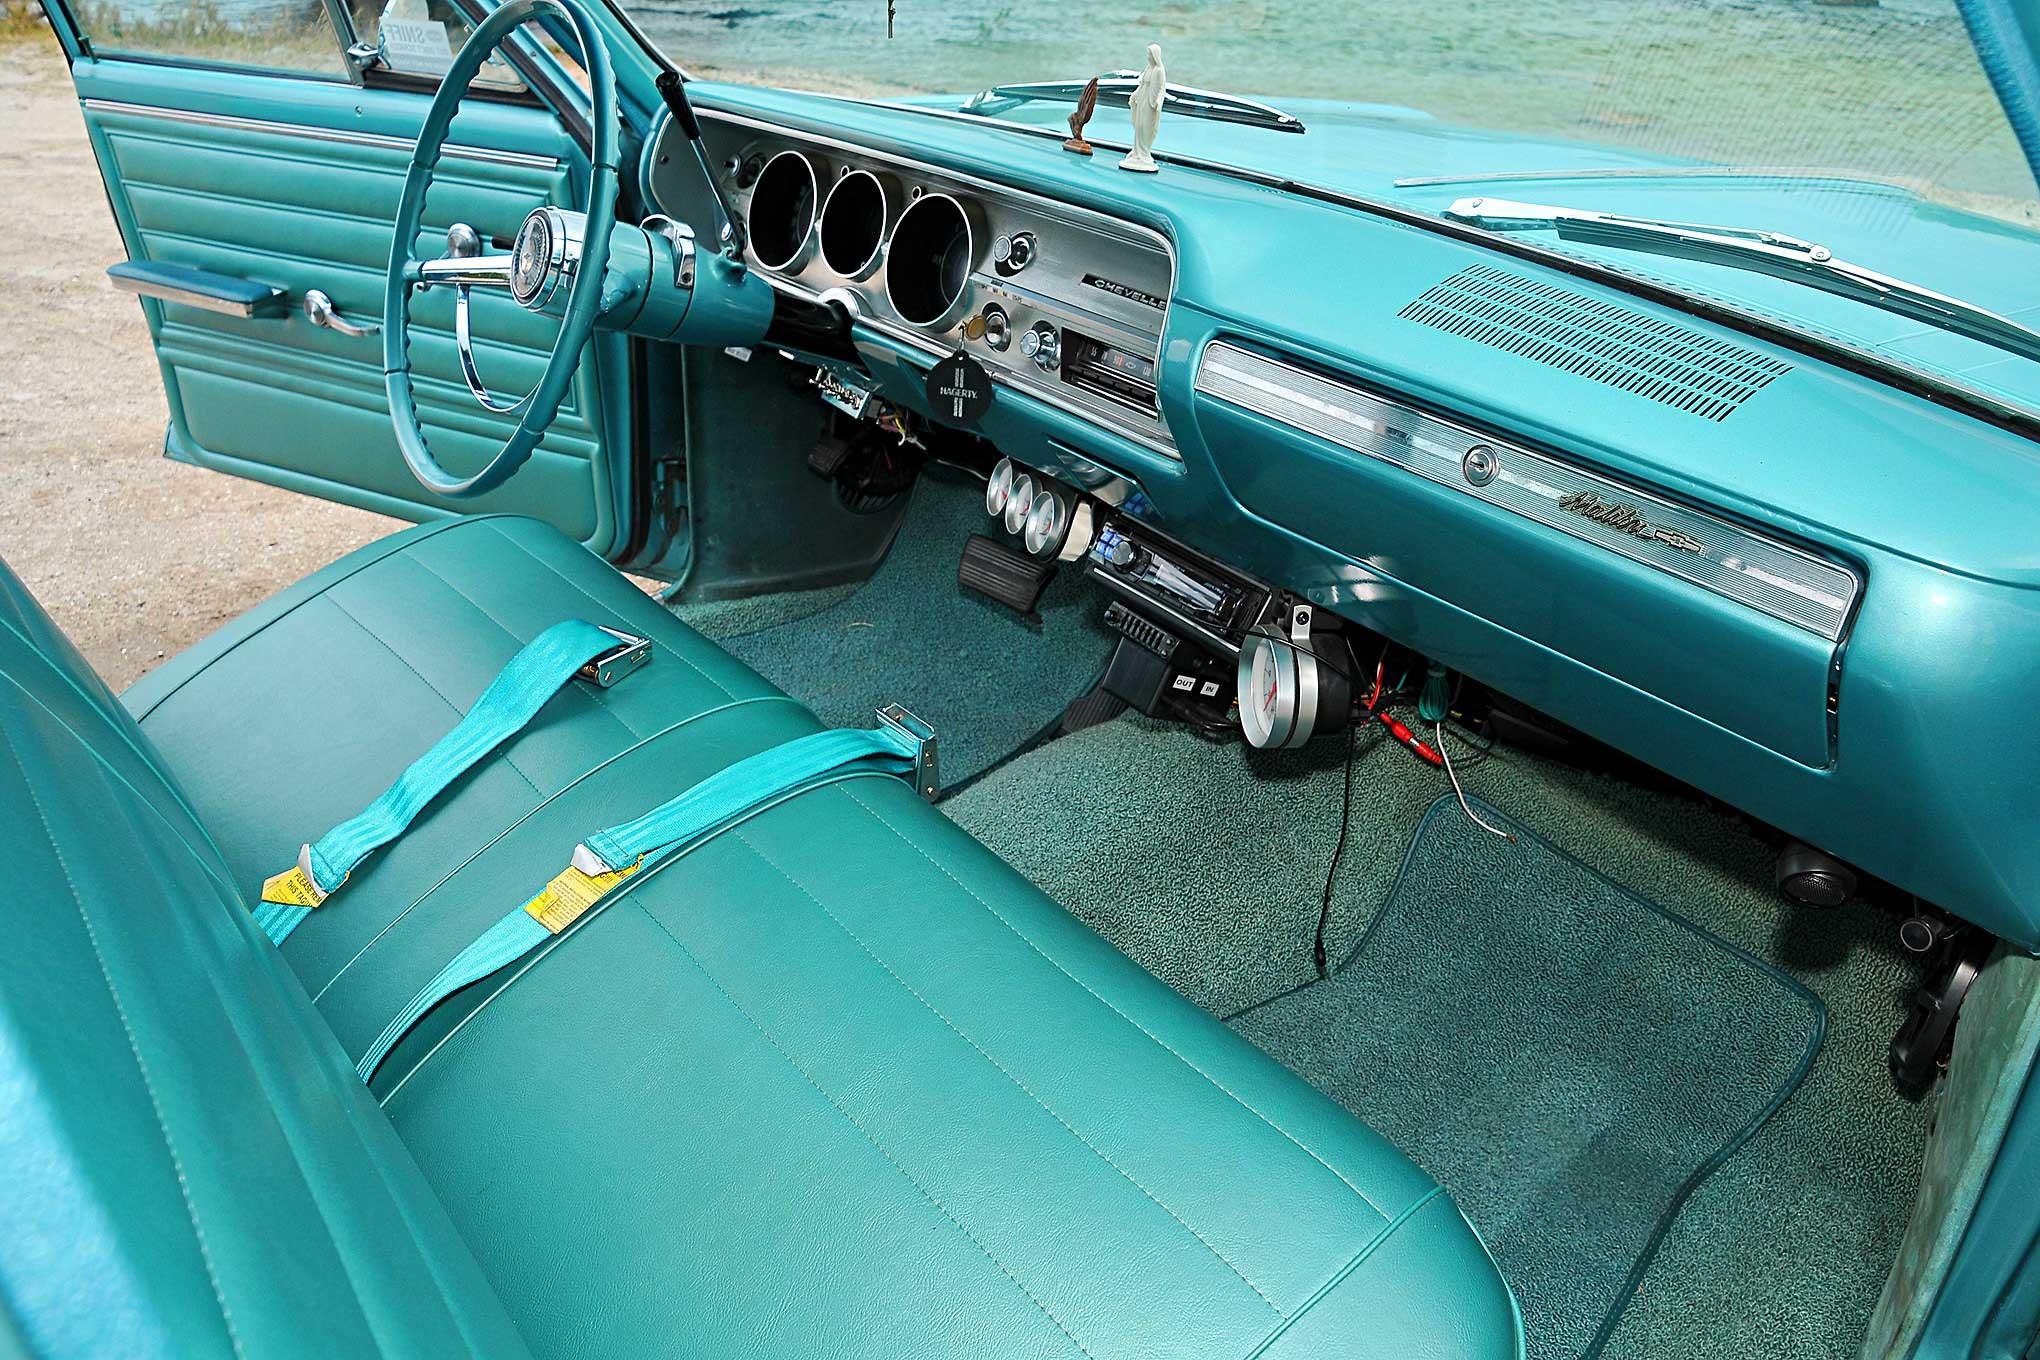 1965 Chevrolet Malibu Wagon - La Burra